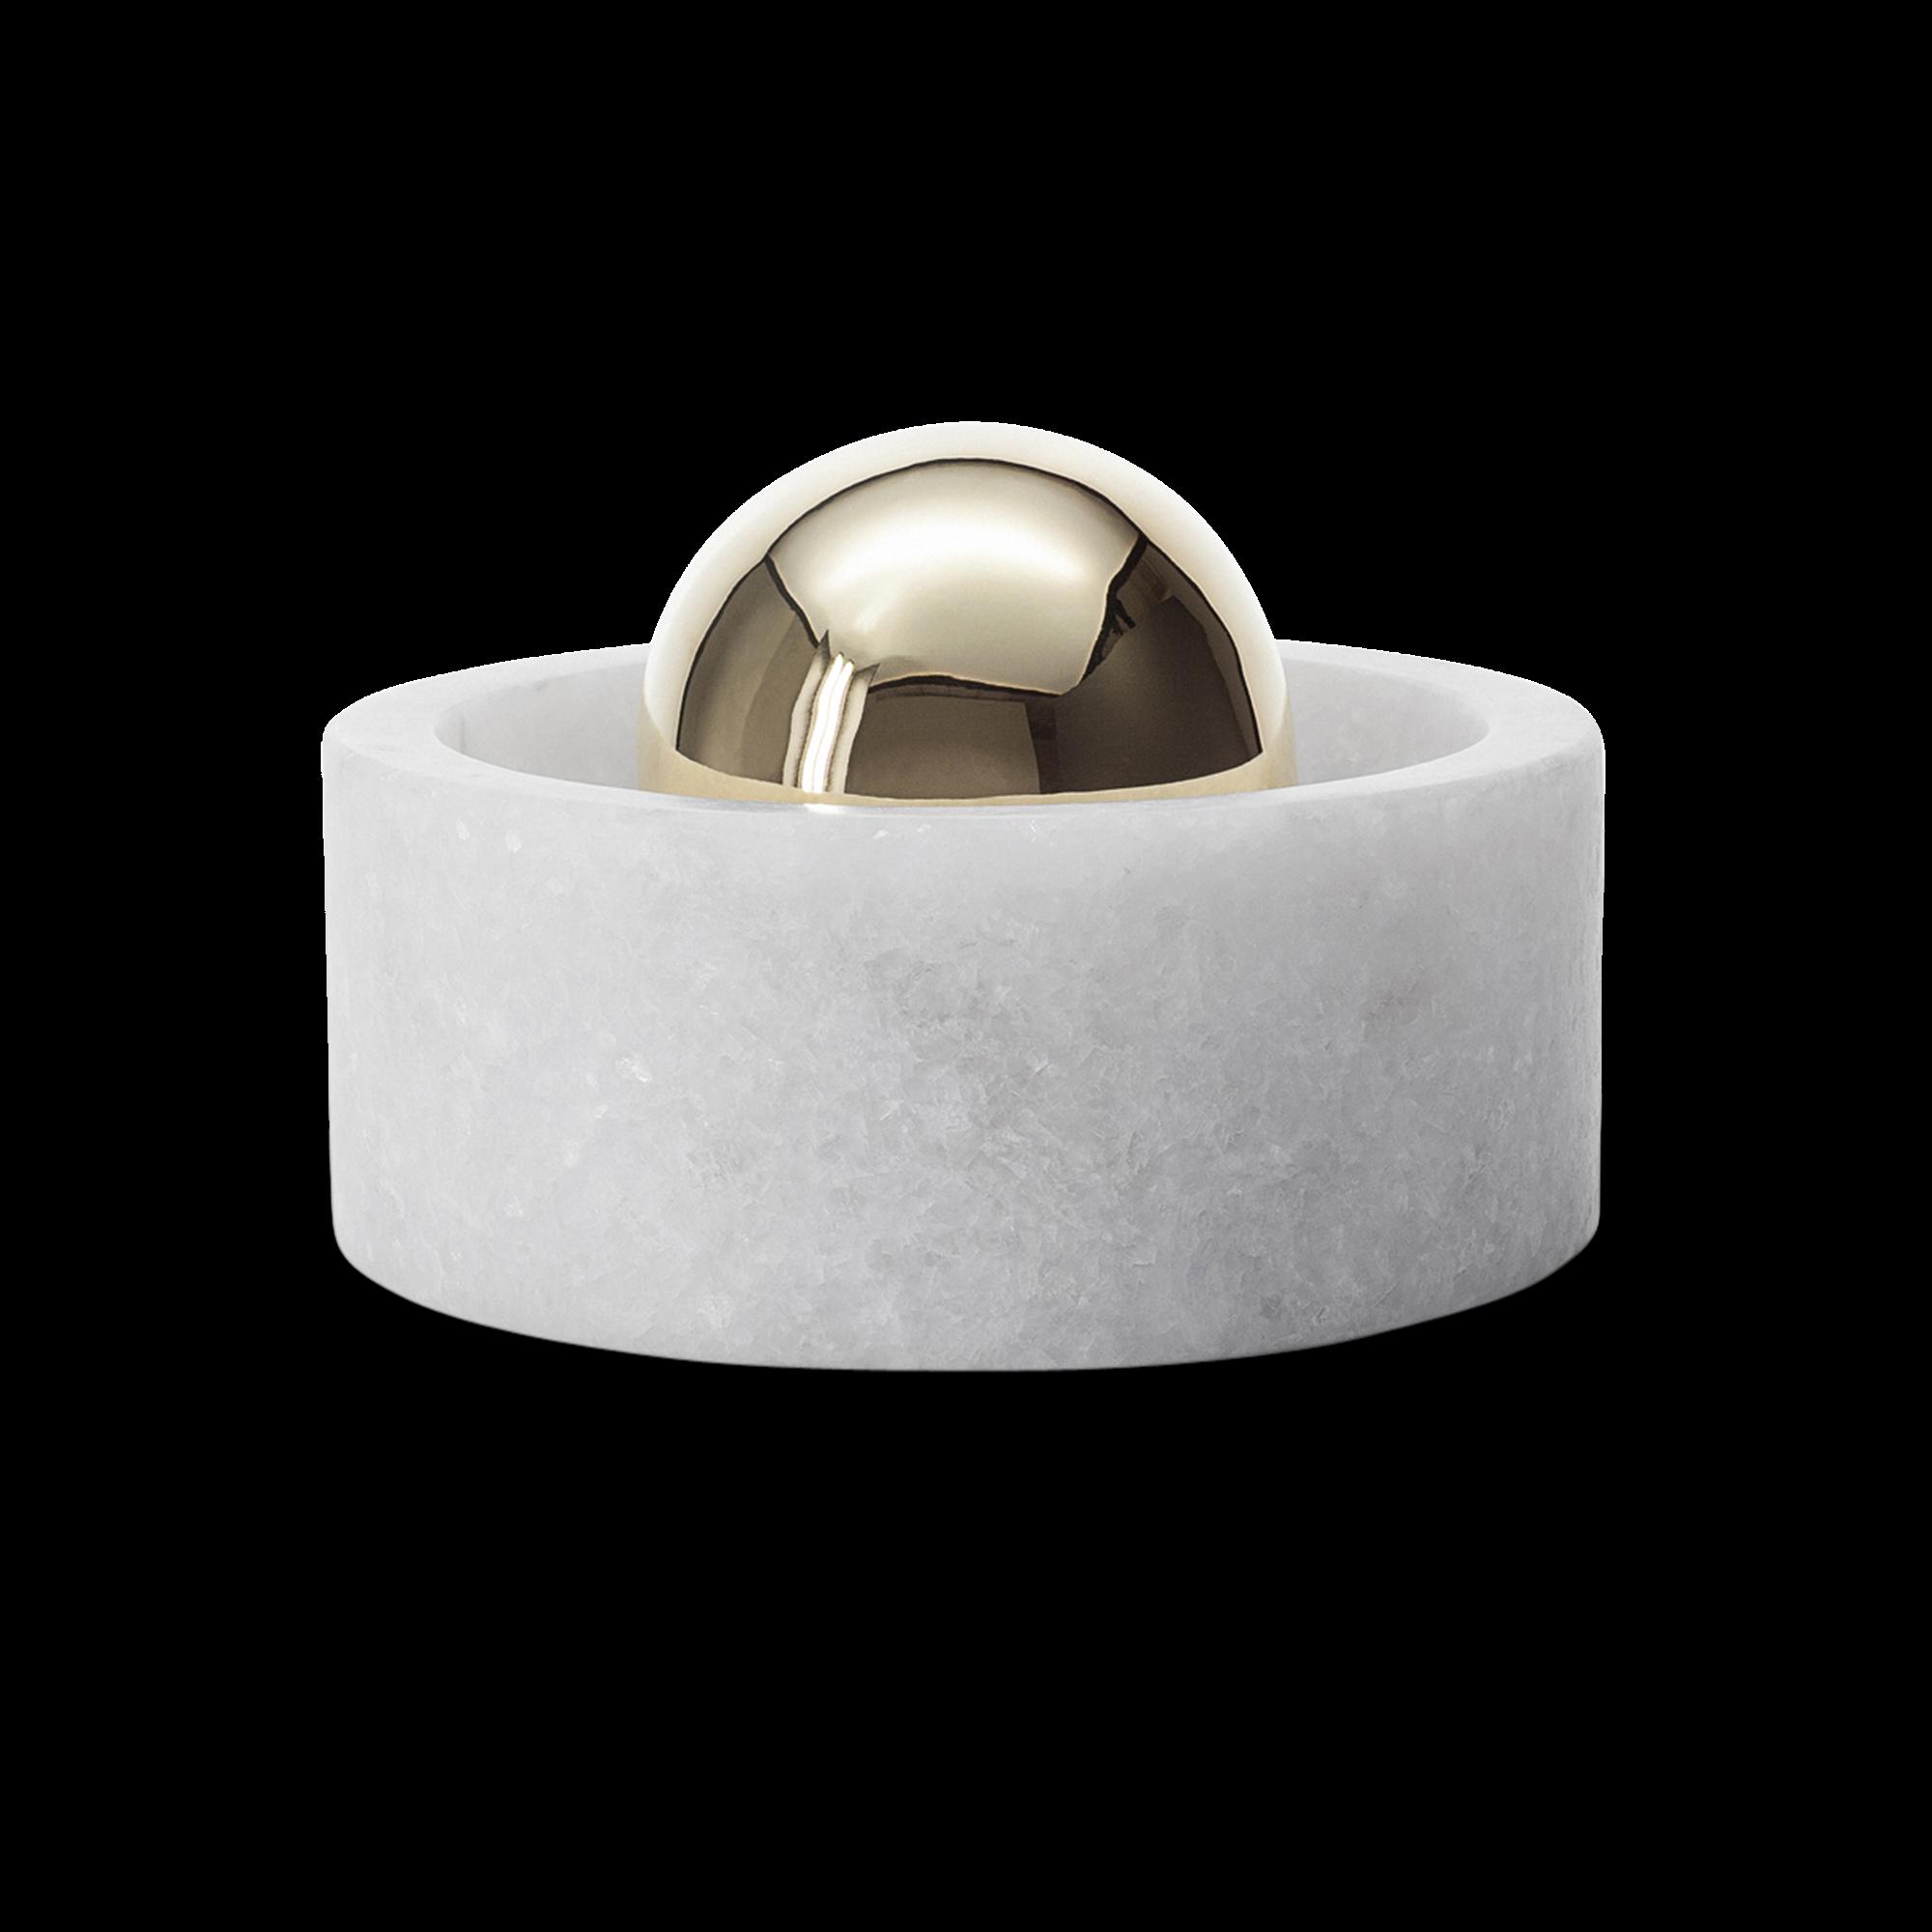 stone-spice-grinder